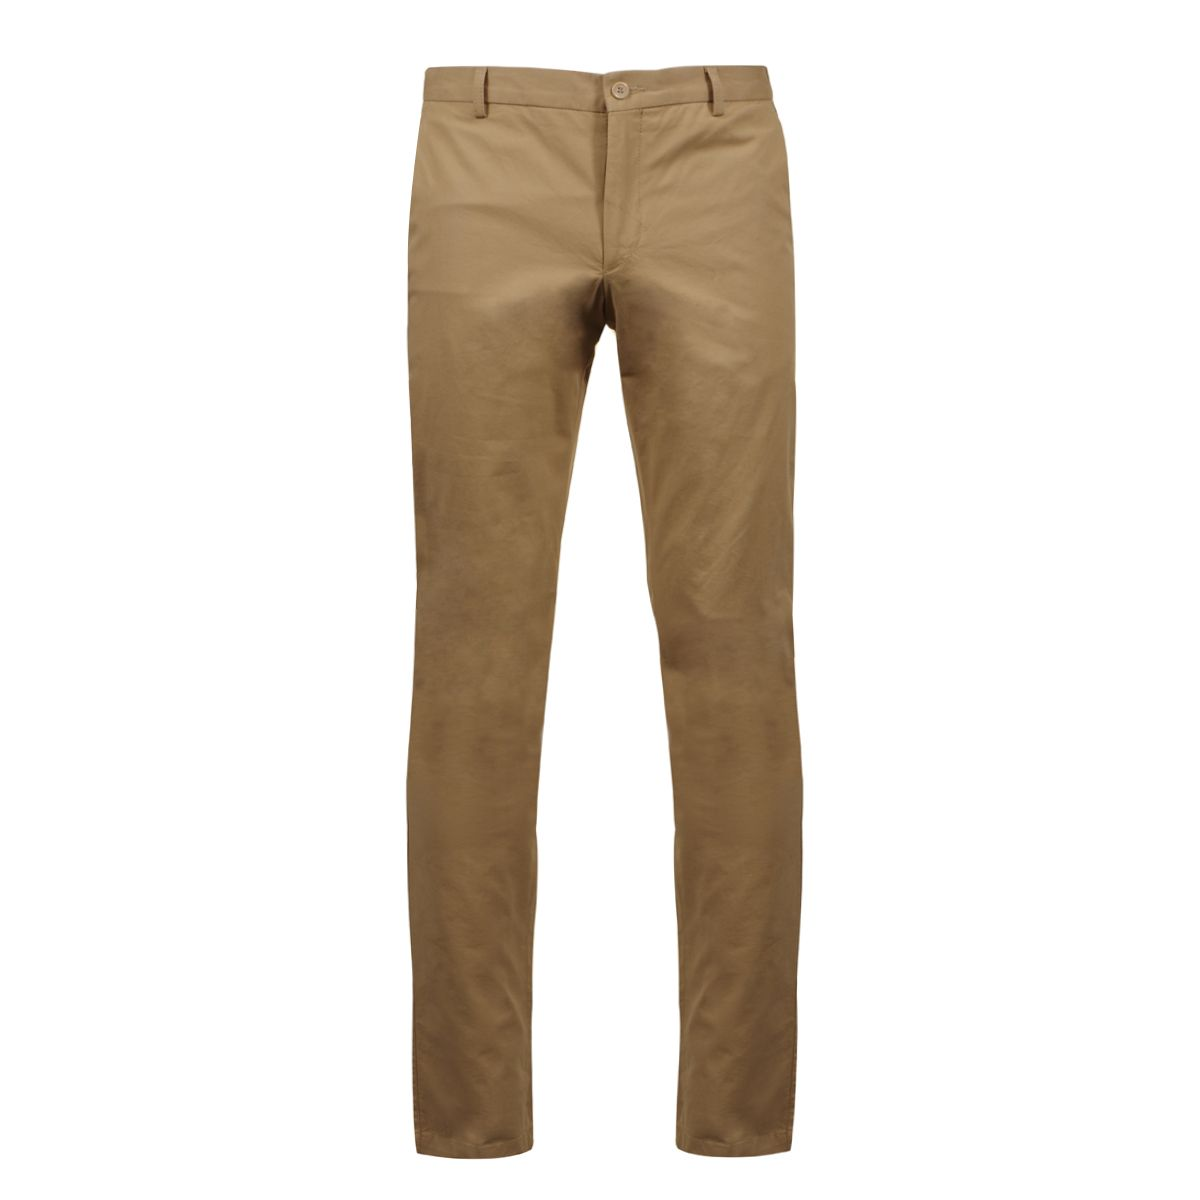 pantalon chino beige grande longueur de jambe 38us size factory maneven. Black Bedroom Furniture Sets. Home Design Ideas